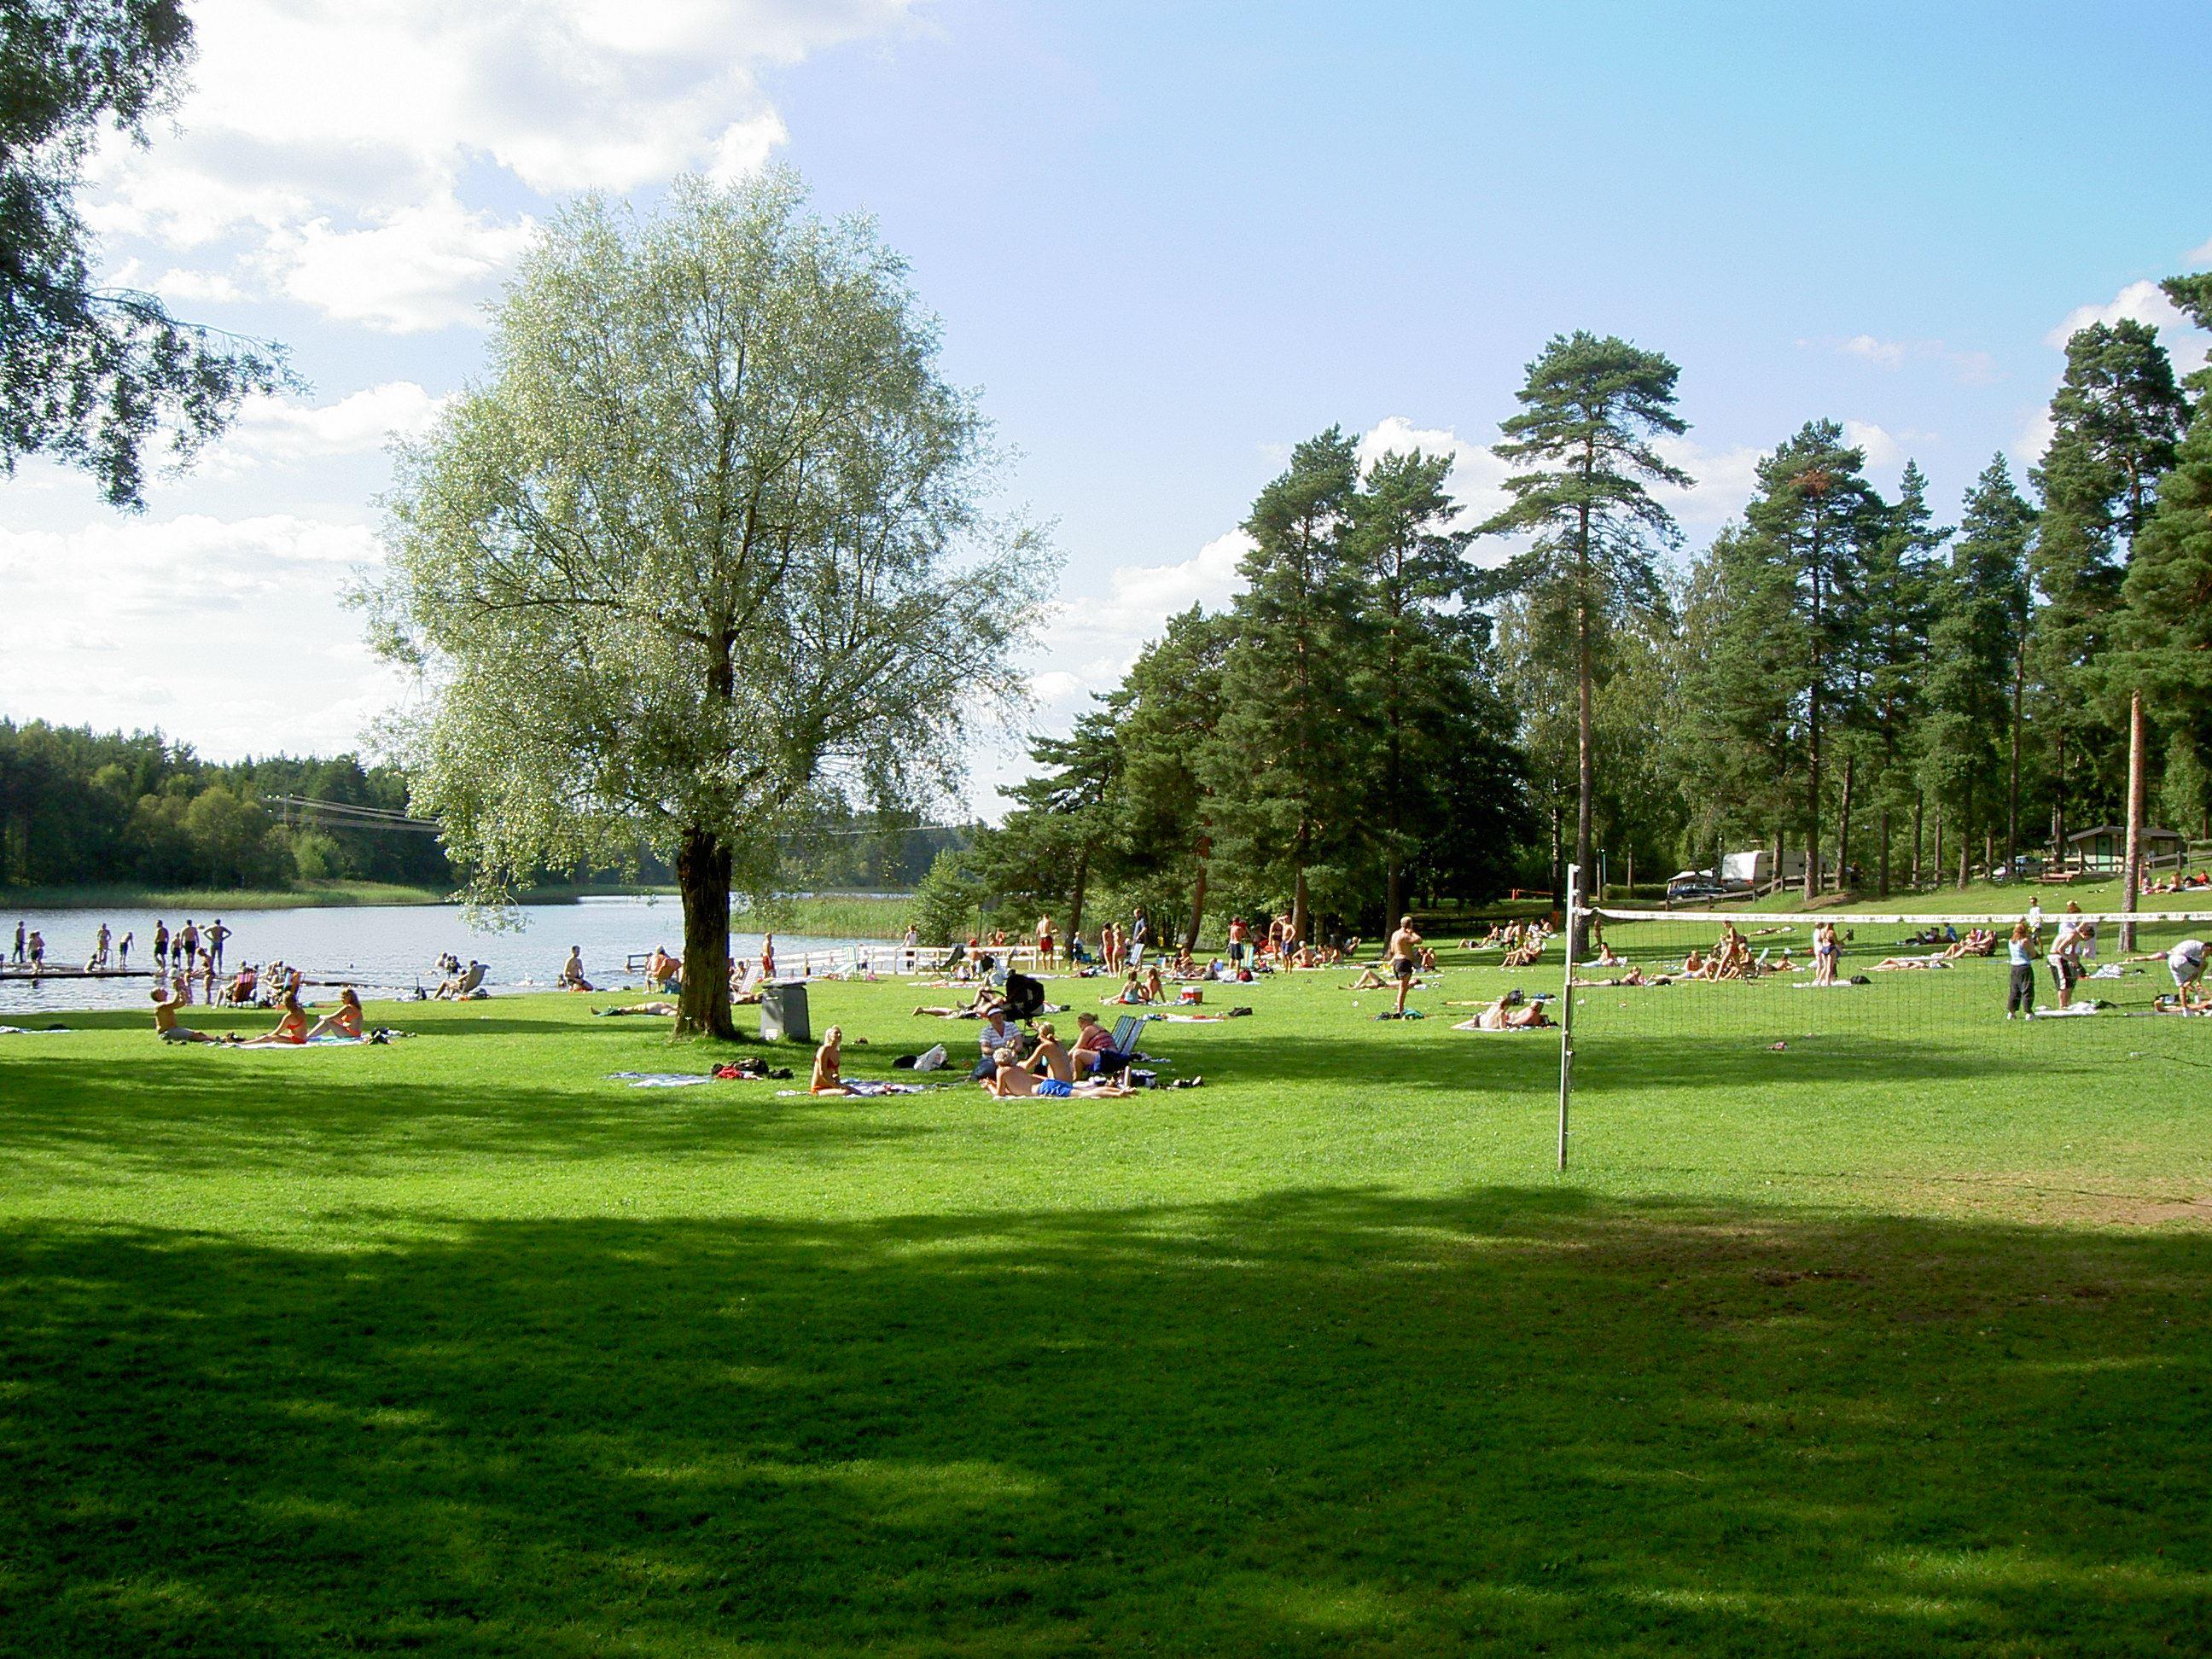 Vaggeryds kommun, Swim in Hjortsjön, Vaggeryd's municipality